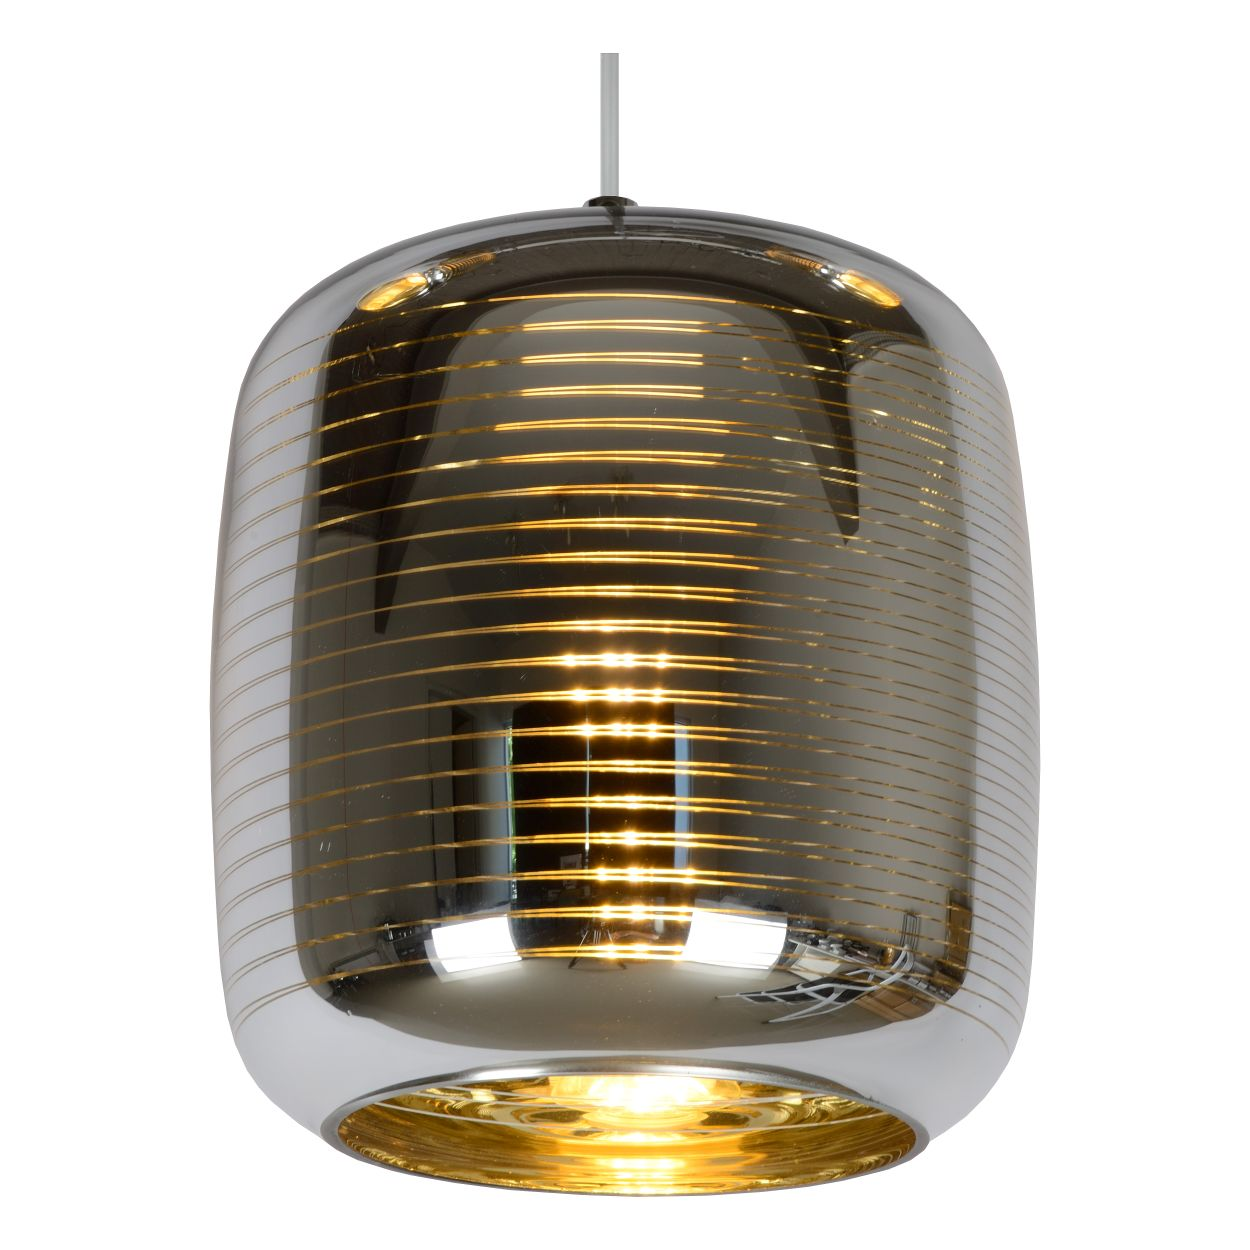 Lampa wisząca ERYN - 70483/03/11